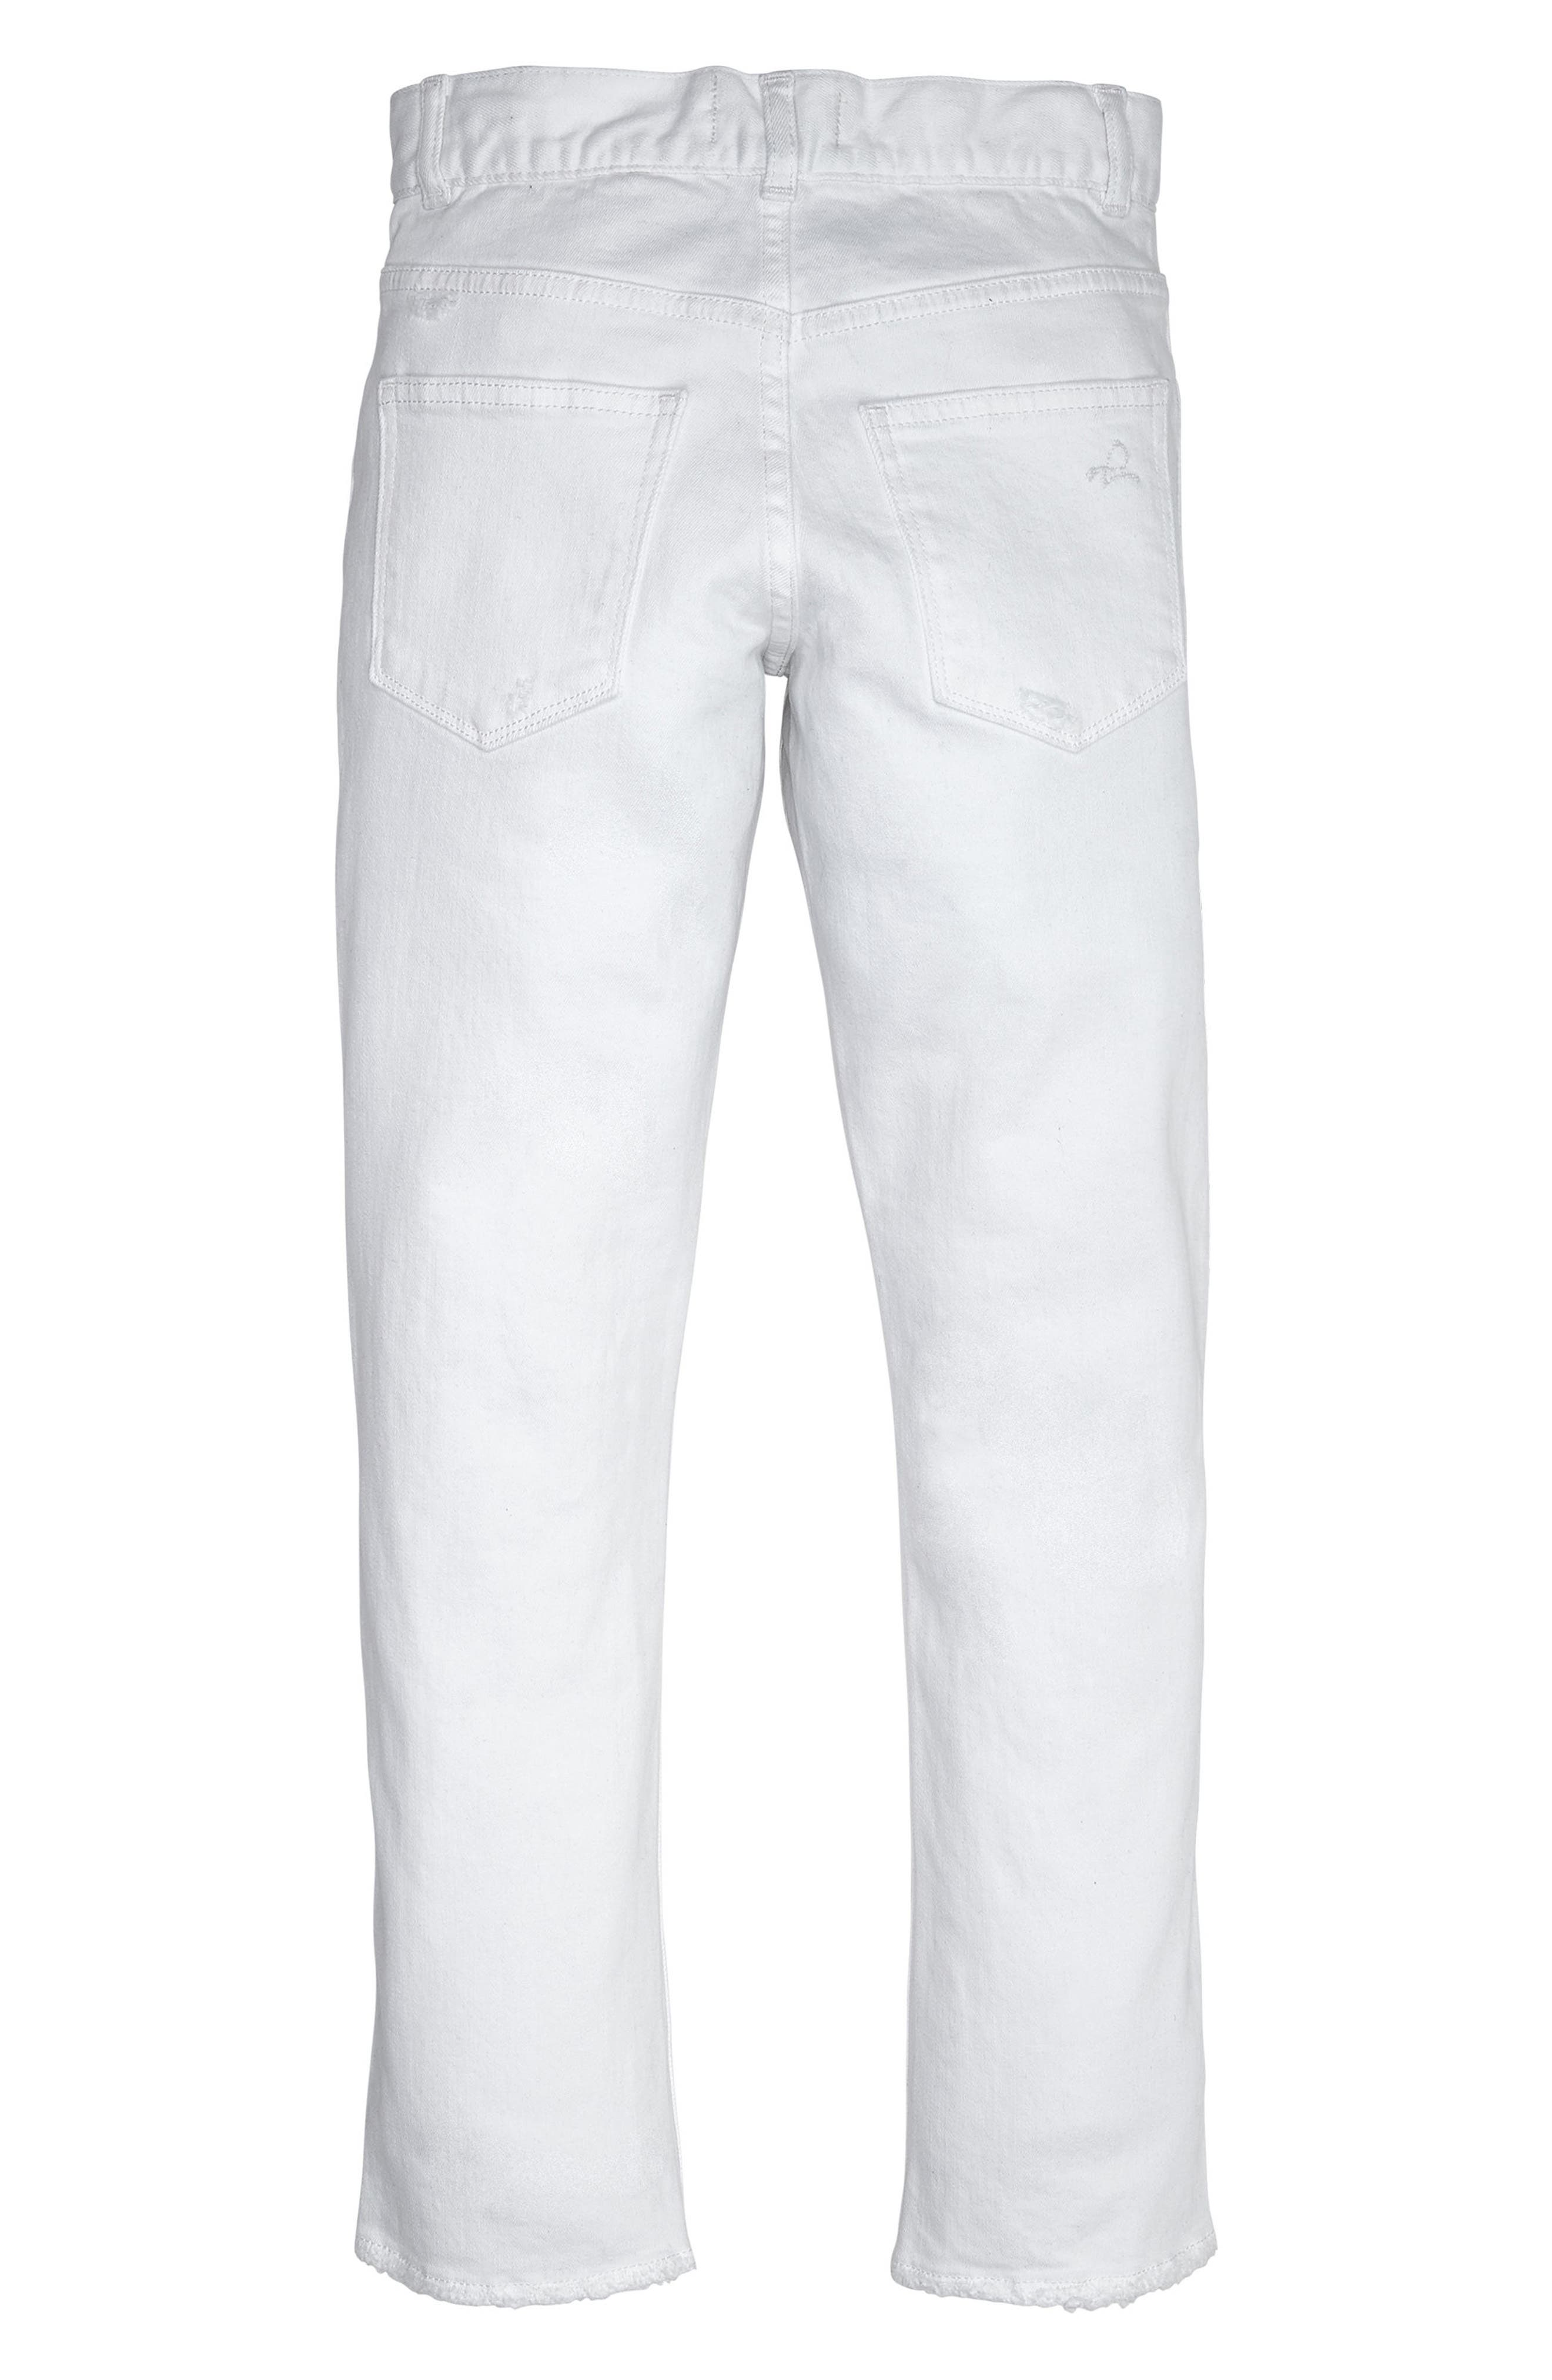 Brady Distressed Slim Fit Jeans,                             Alternate thumbnail 2, color,                             Bulletproof